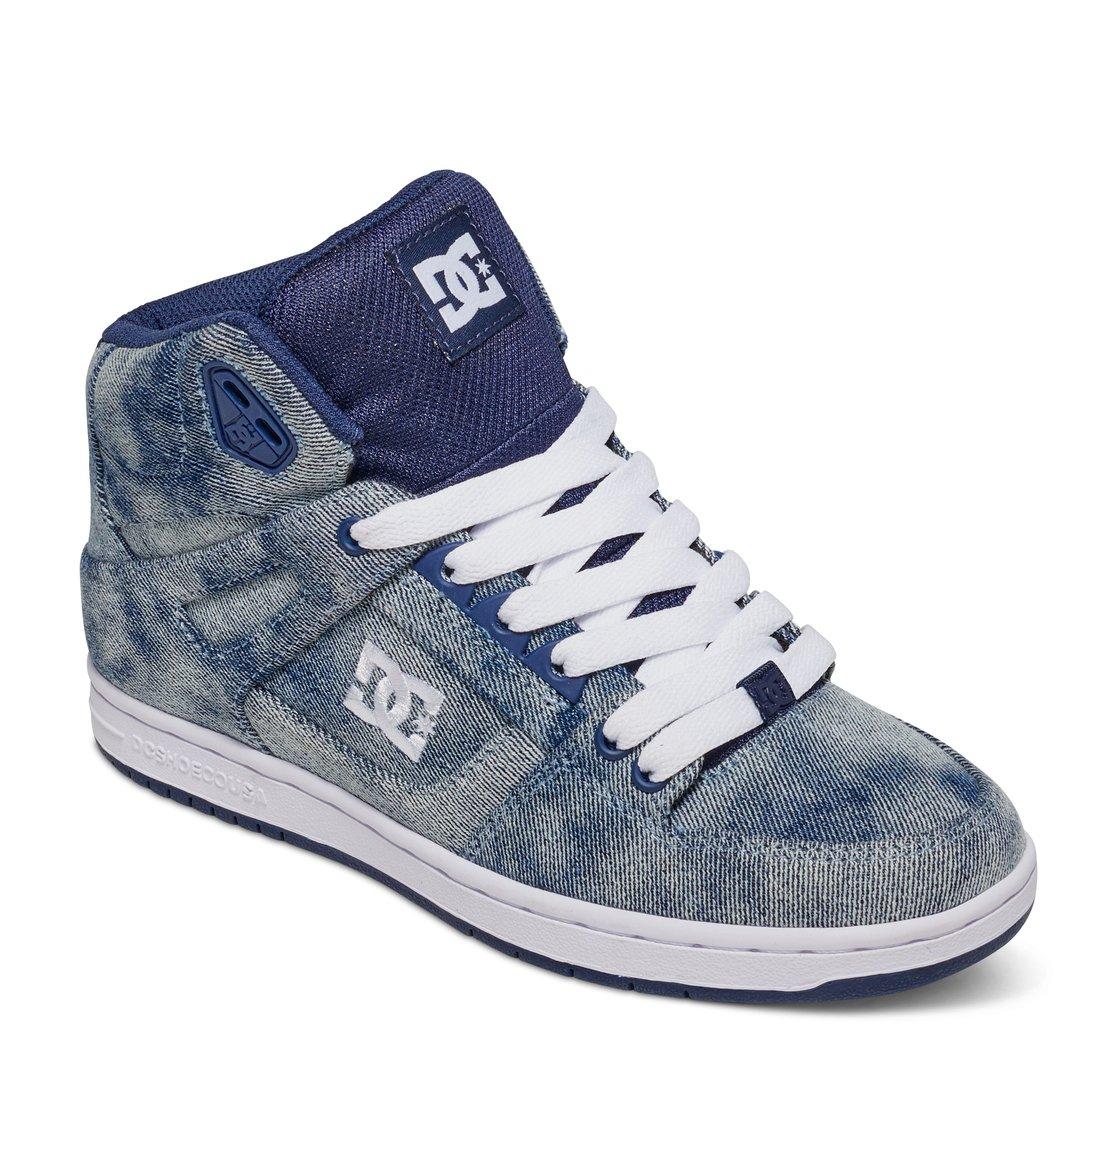 High Women's Shoes Rebound Top 320028Dc Se hxtQsrdC